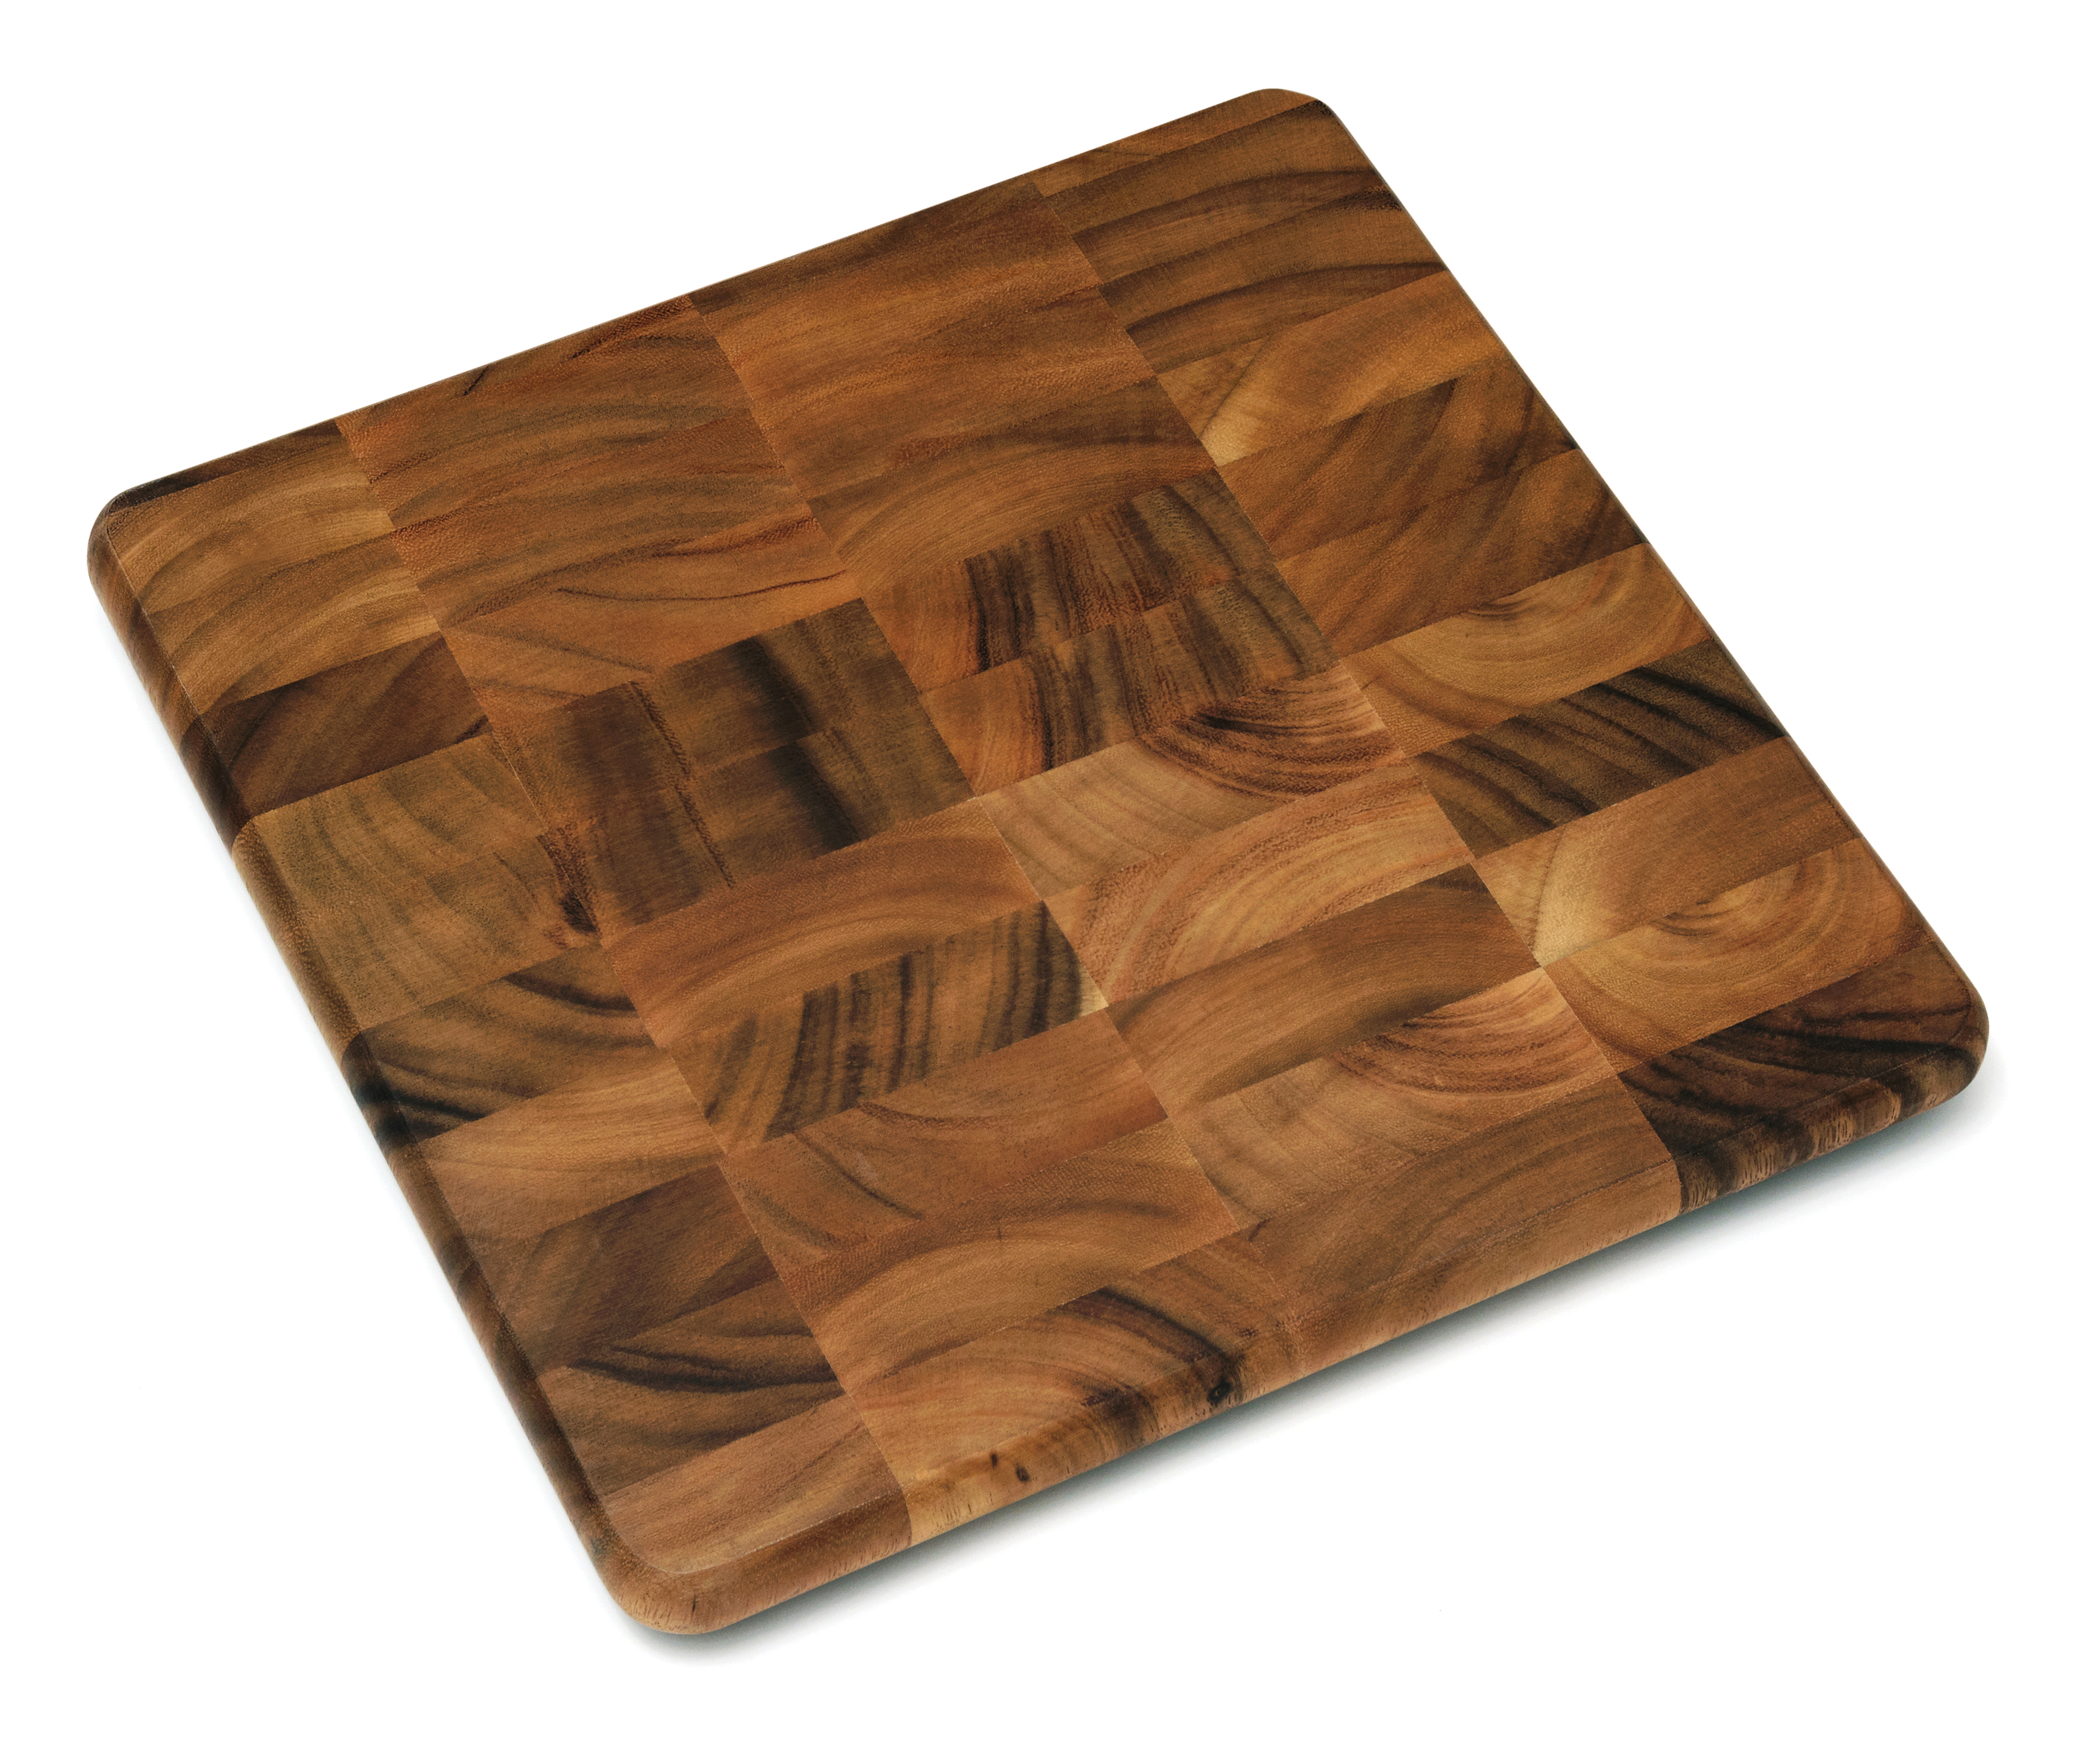 acacia square chopping block kitchen cutting table